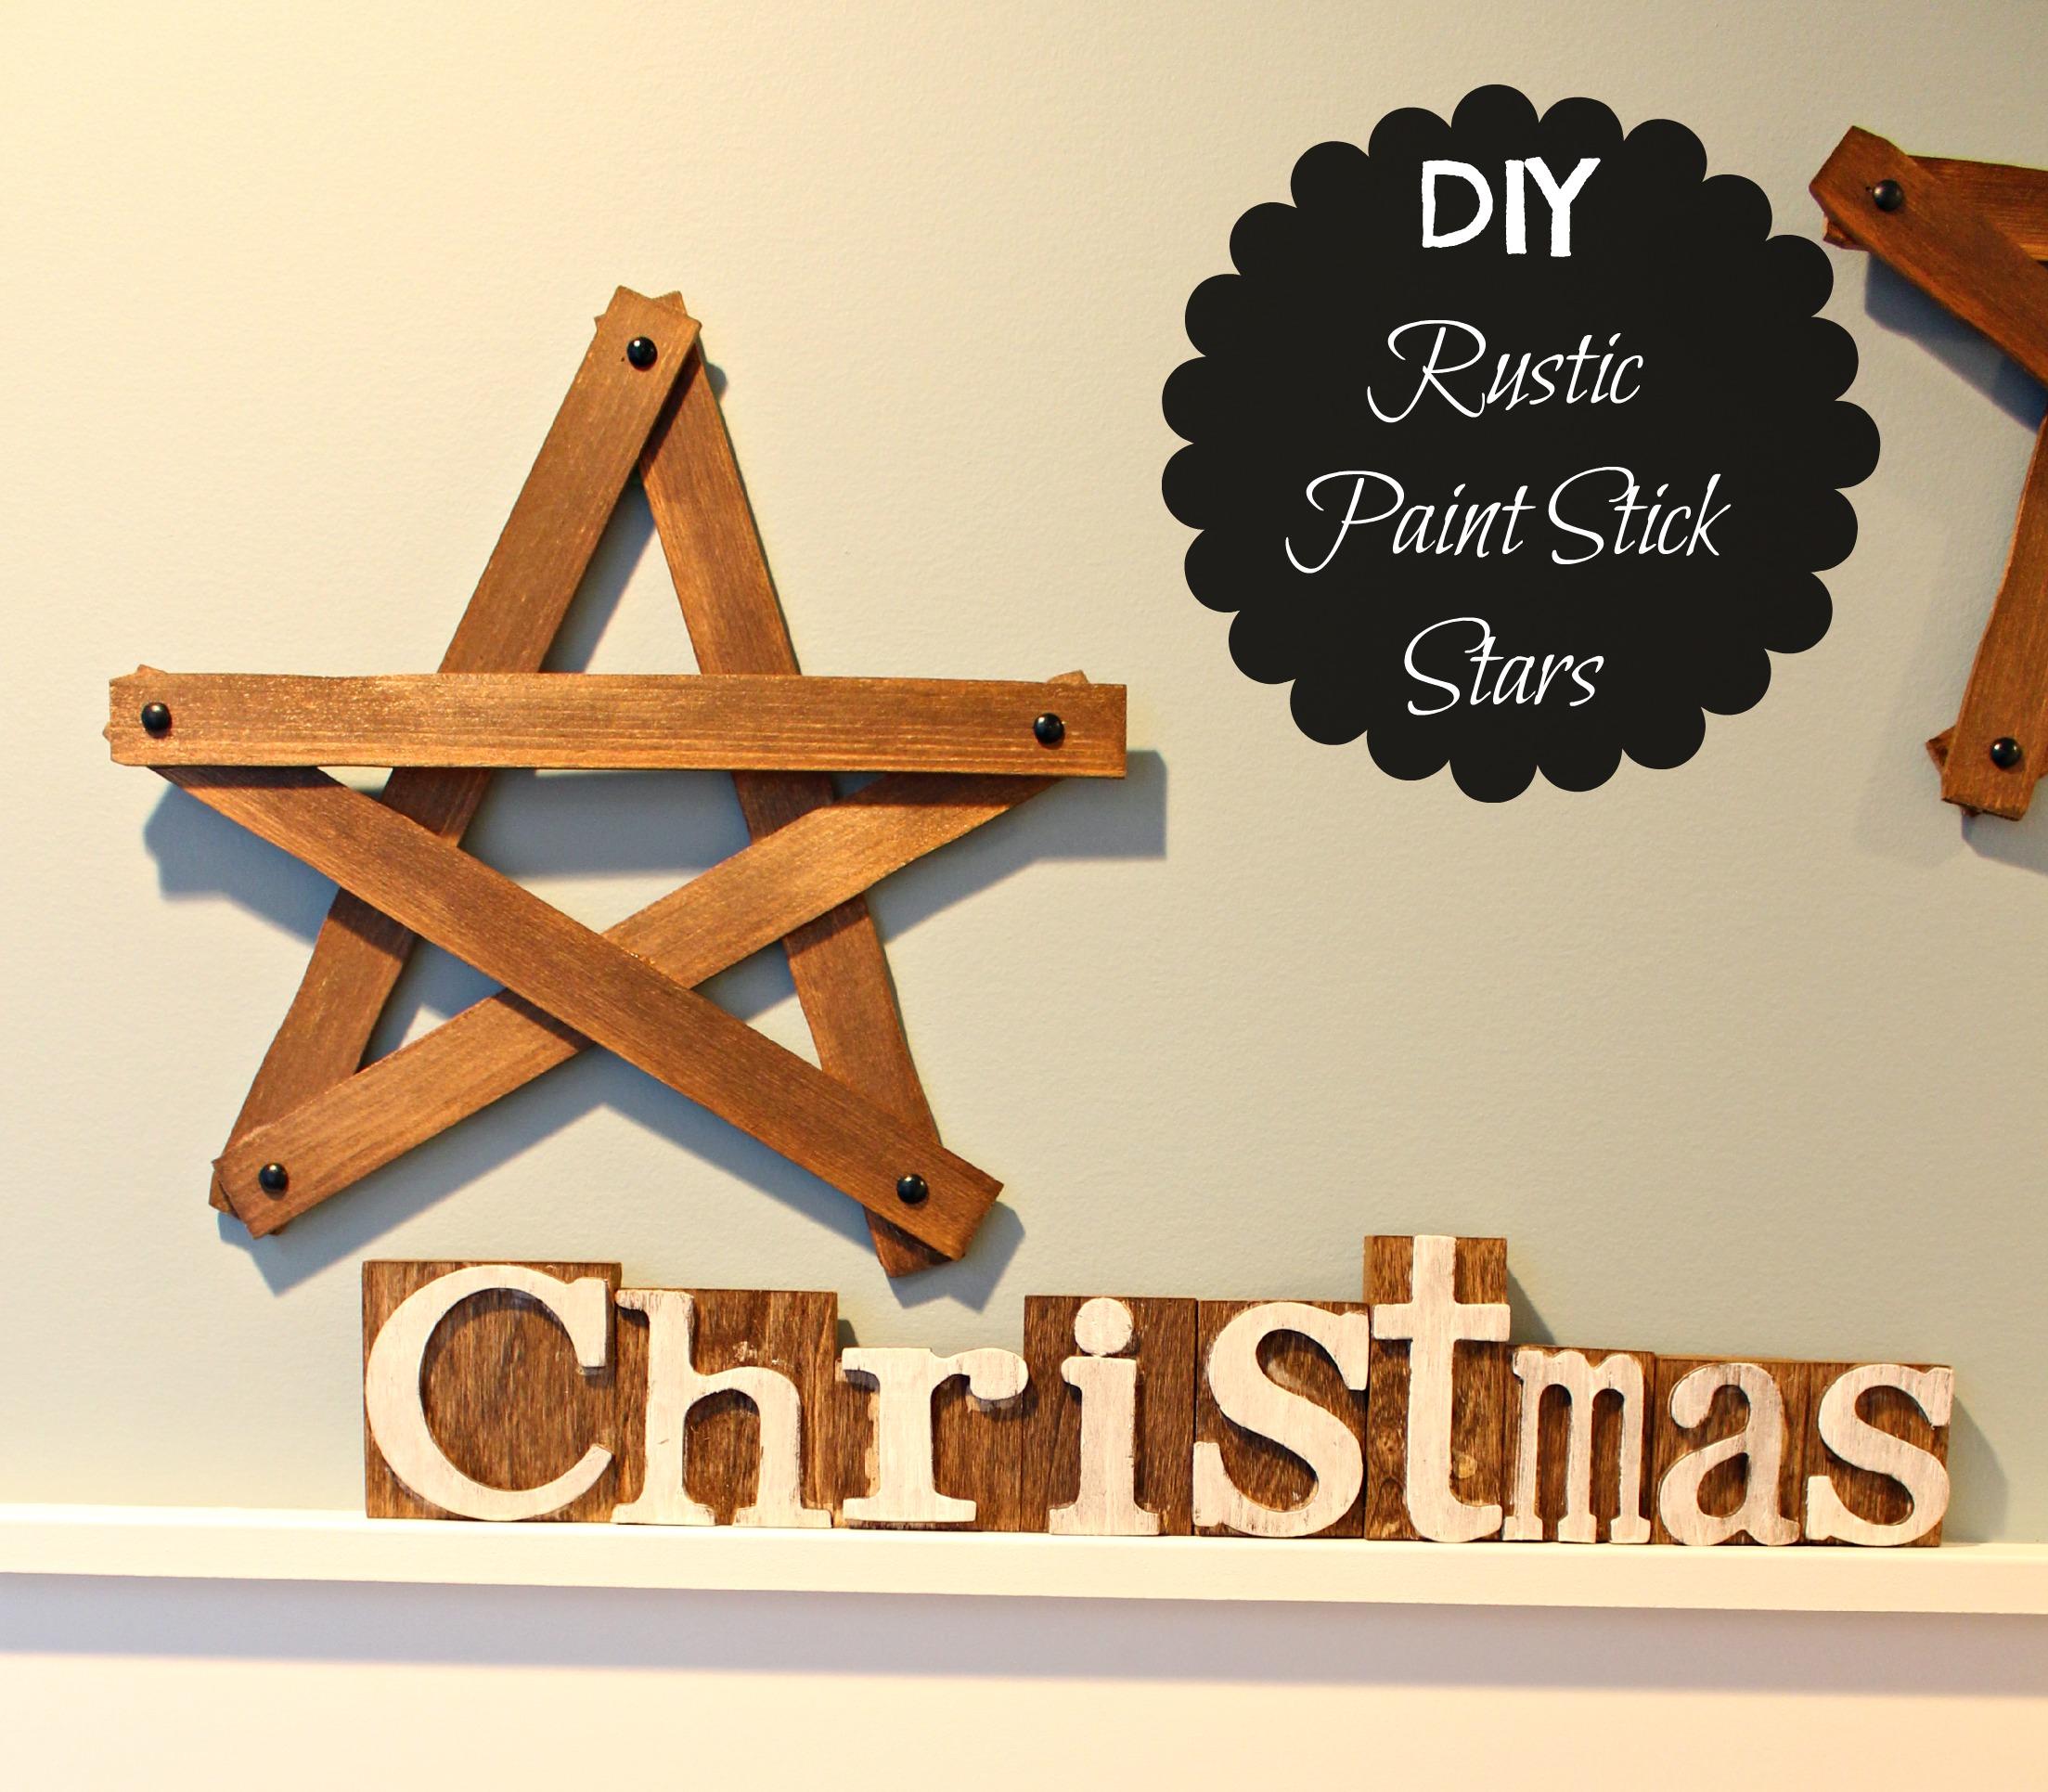 The Happy Housie DIY Rustic Paint Stick Stars